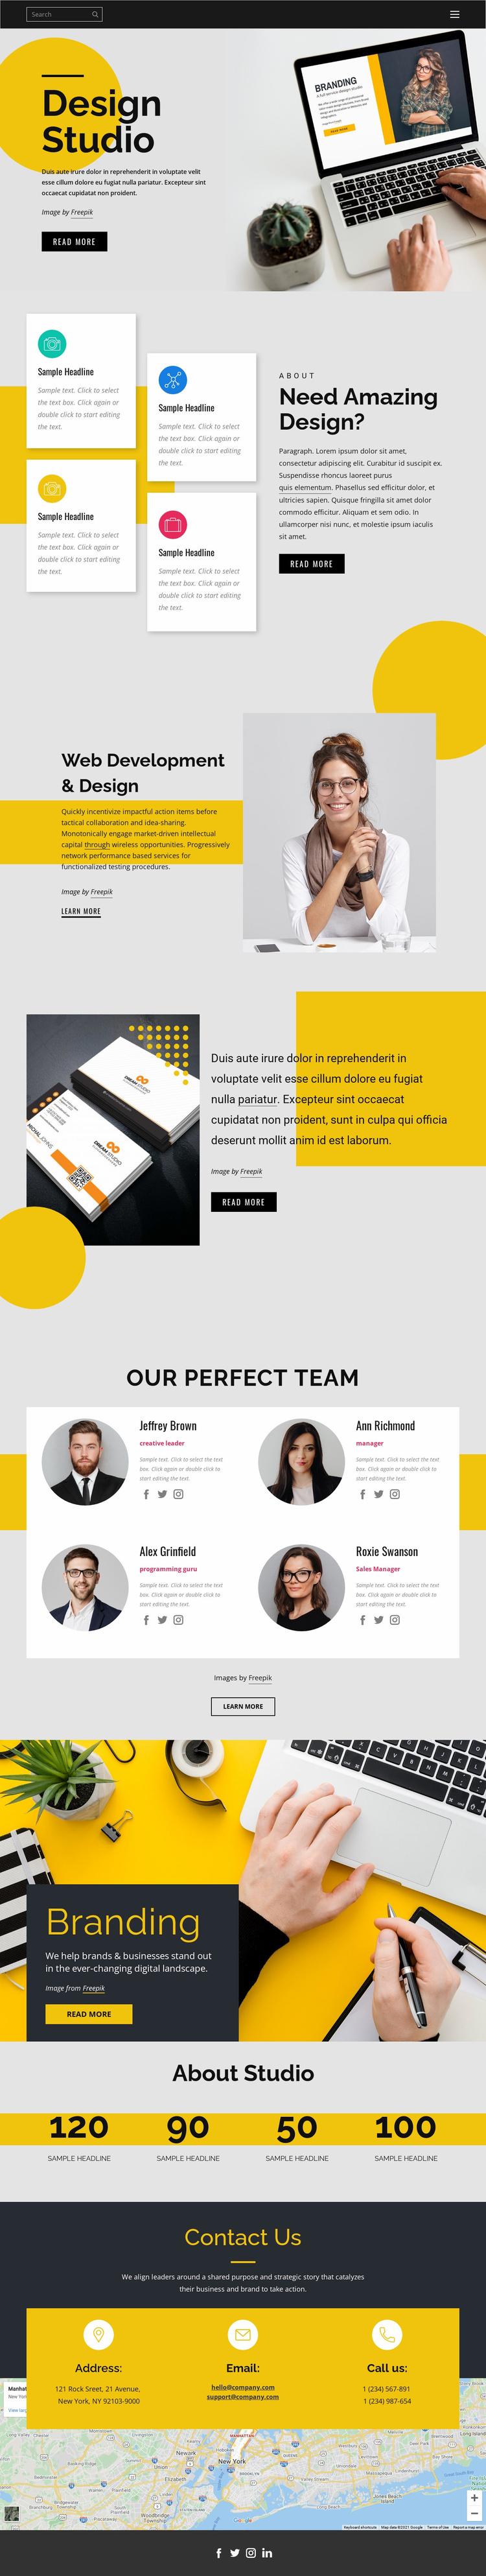 Brand, print & web design Landing Page